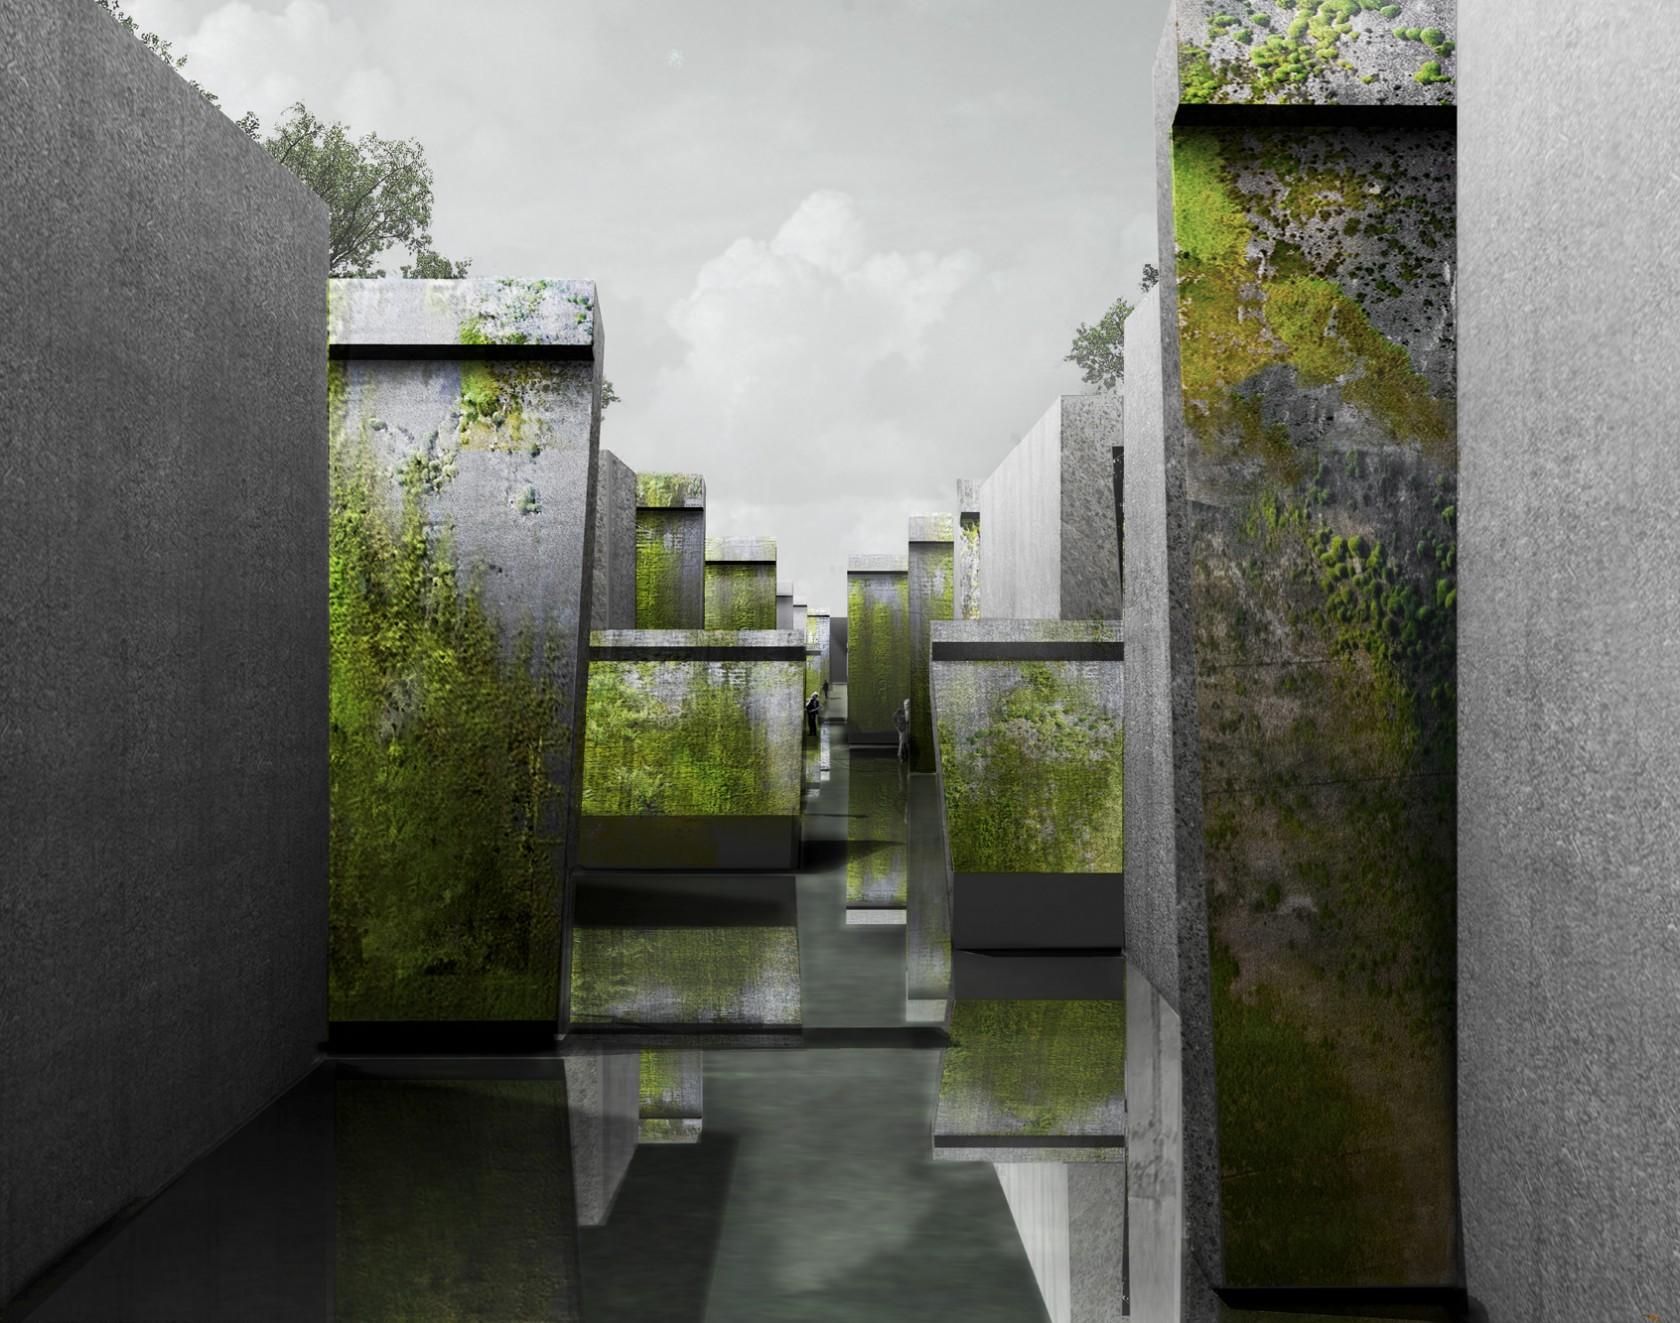 RAAAF-Rietveld-Architecture-Art-Affordances-Deltawerk-M1611-001006image